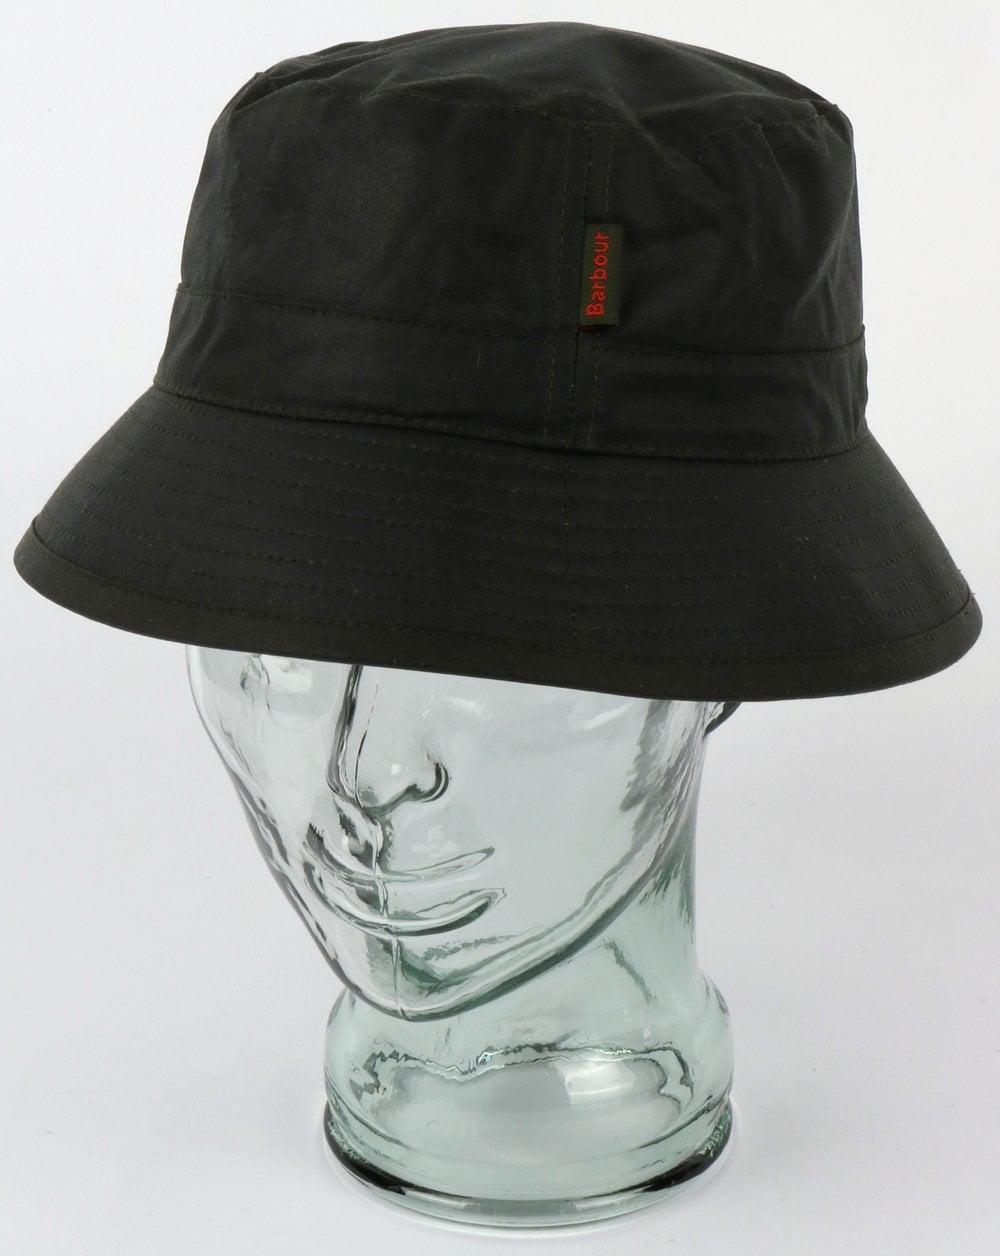 9dab9ecb7e4 Barbour Wax Bucket Hat Sage